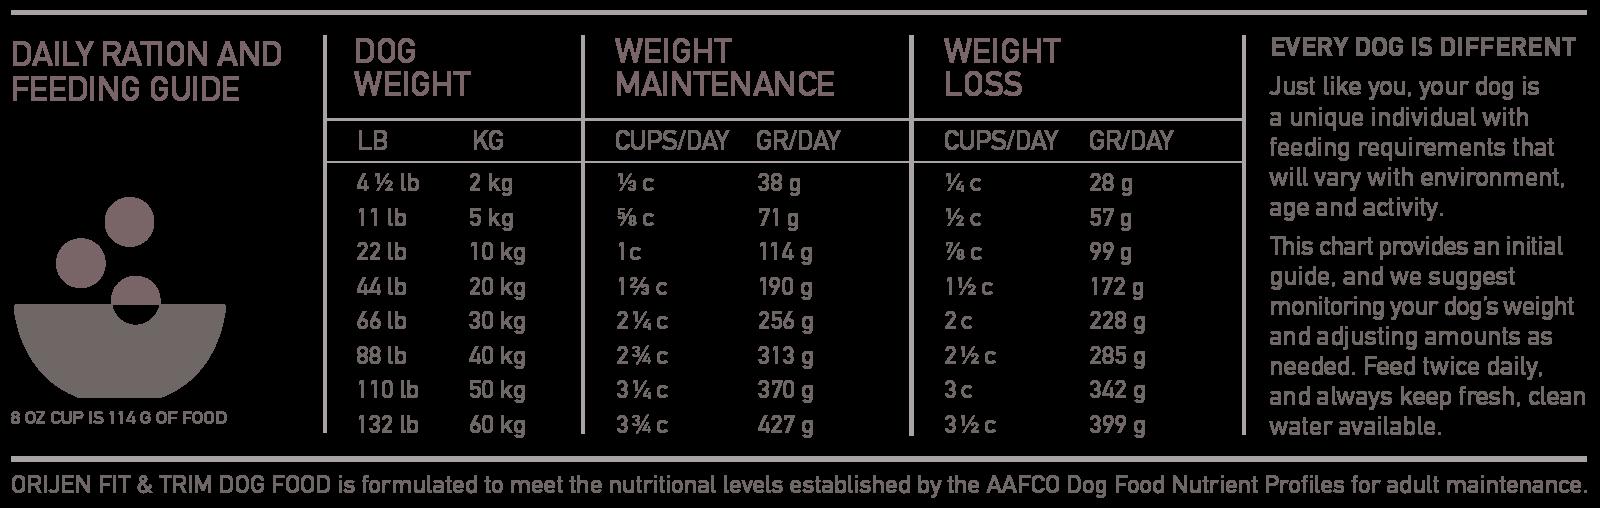 ORIJEN Fit and Trim Biologically Appropriate Dog Food Feeding Chart